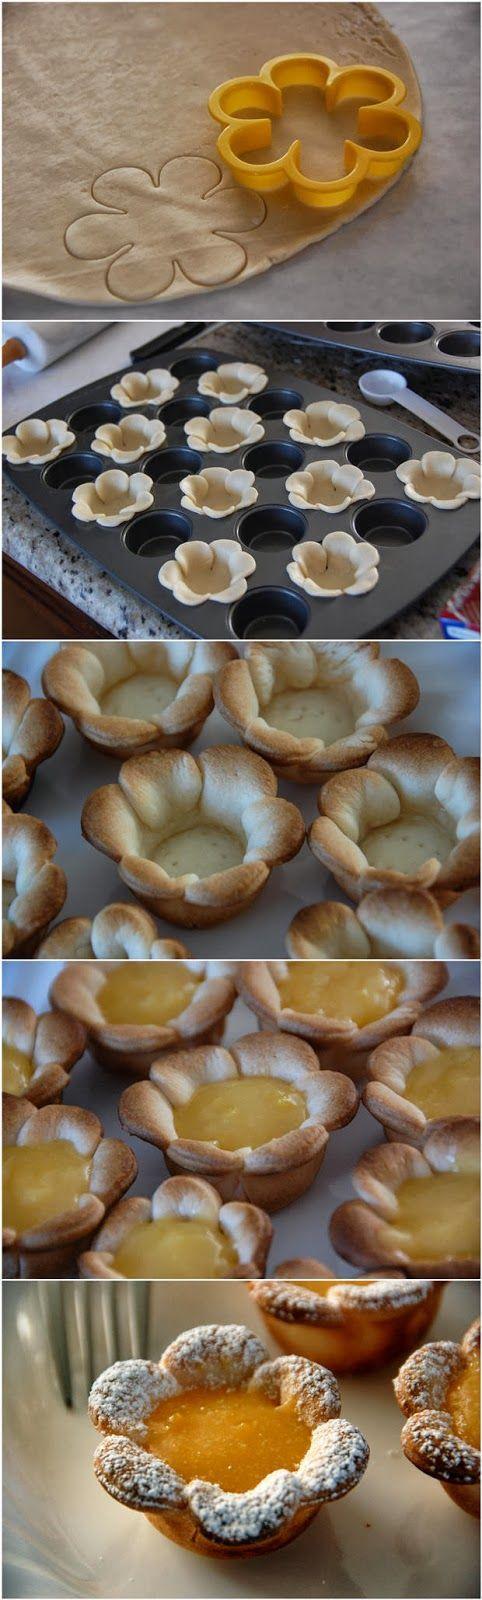 Flower shaped Mini Lemon Curd Tarts http://www.kissrecipe.com/2013/10/flower-shaped-mini-lemon-curd-tarts.html